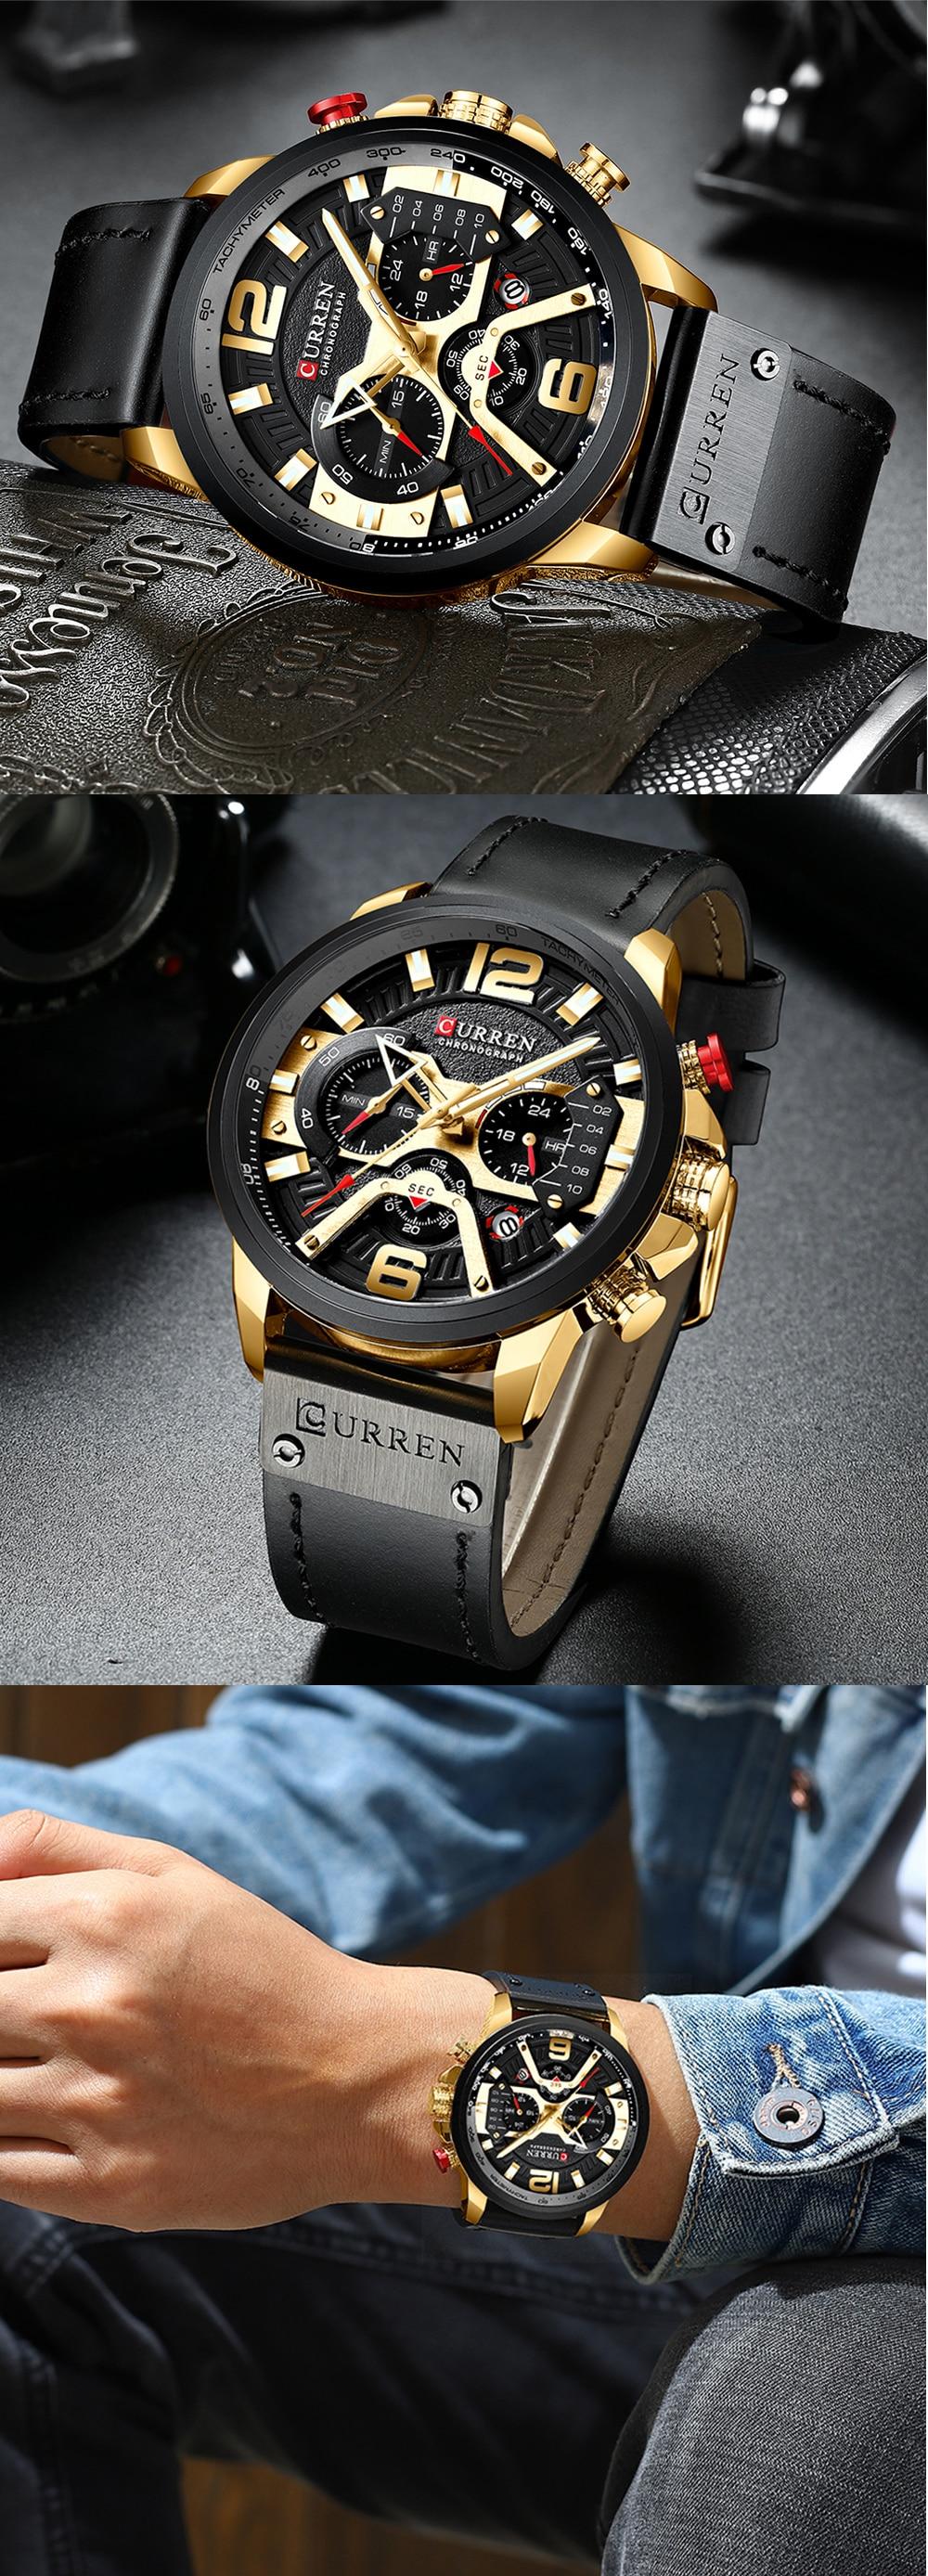 Hc240809b3f404eb1b621b7f2311da8b3T CURREN Watch Men Business Watches Orologio Uomo Leather band Wristwatch Leather Quartz Watch Zegarek Meski Reloj Hombre man gift